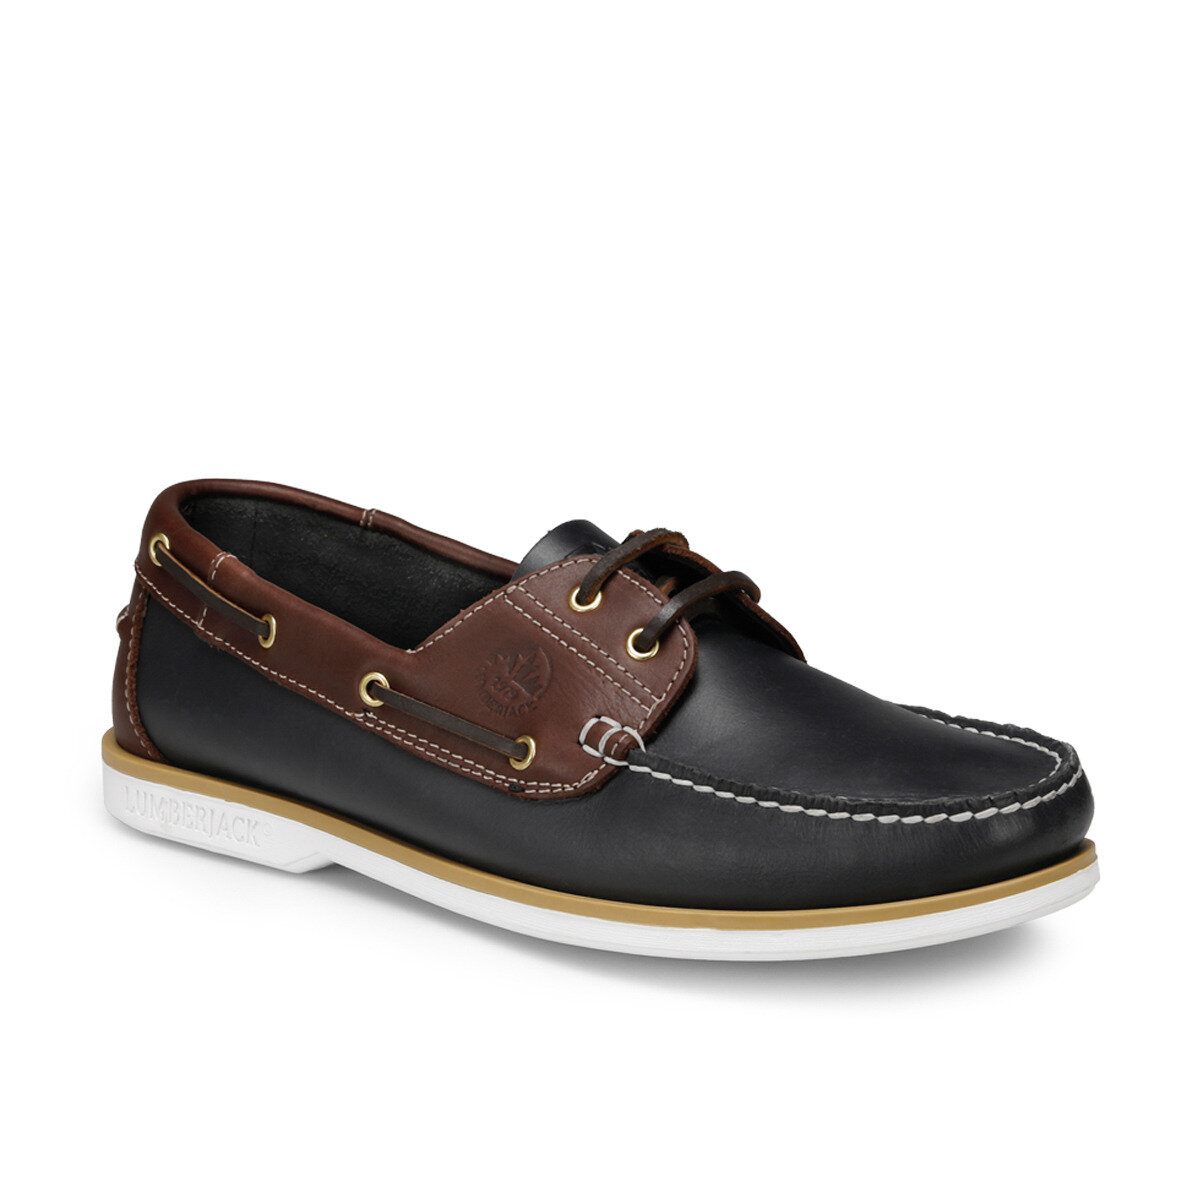 FLO NAVIGATOR Navy Blue Men 'S Shoes LUMBERJACK